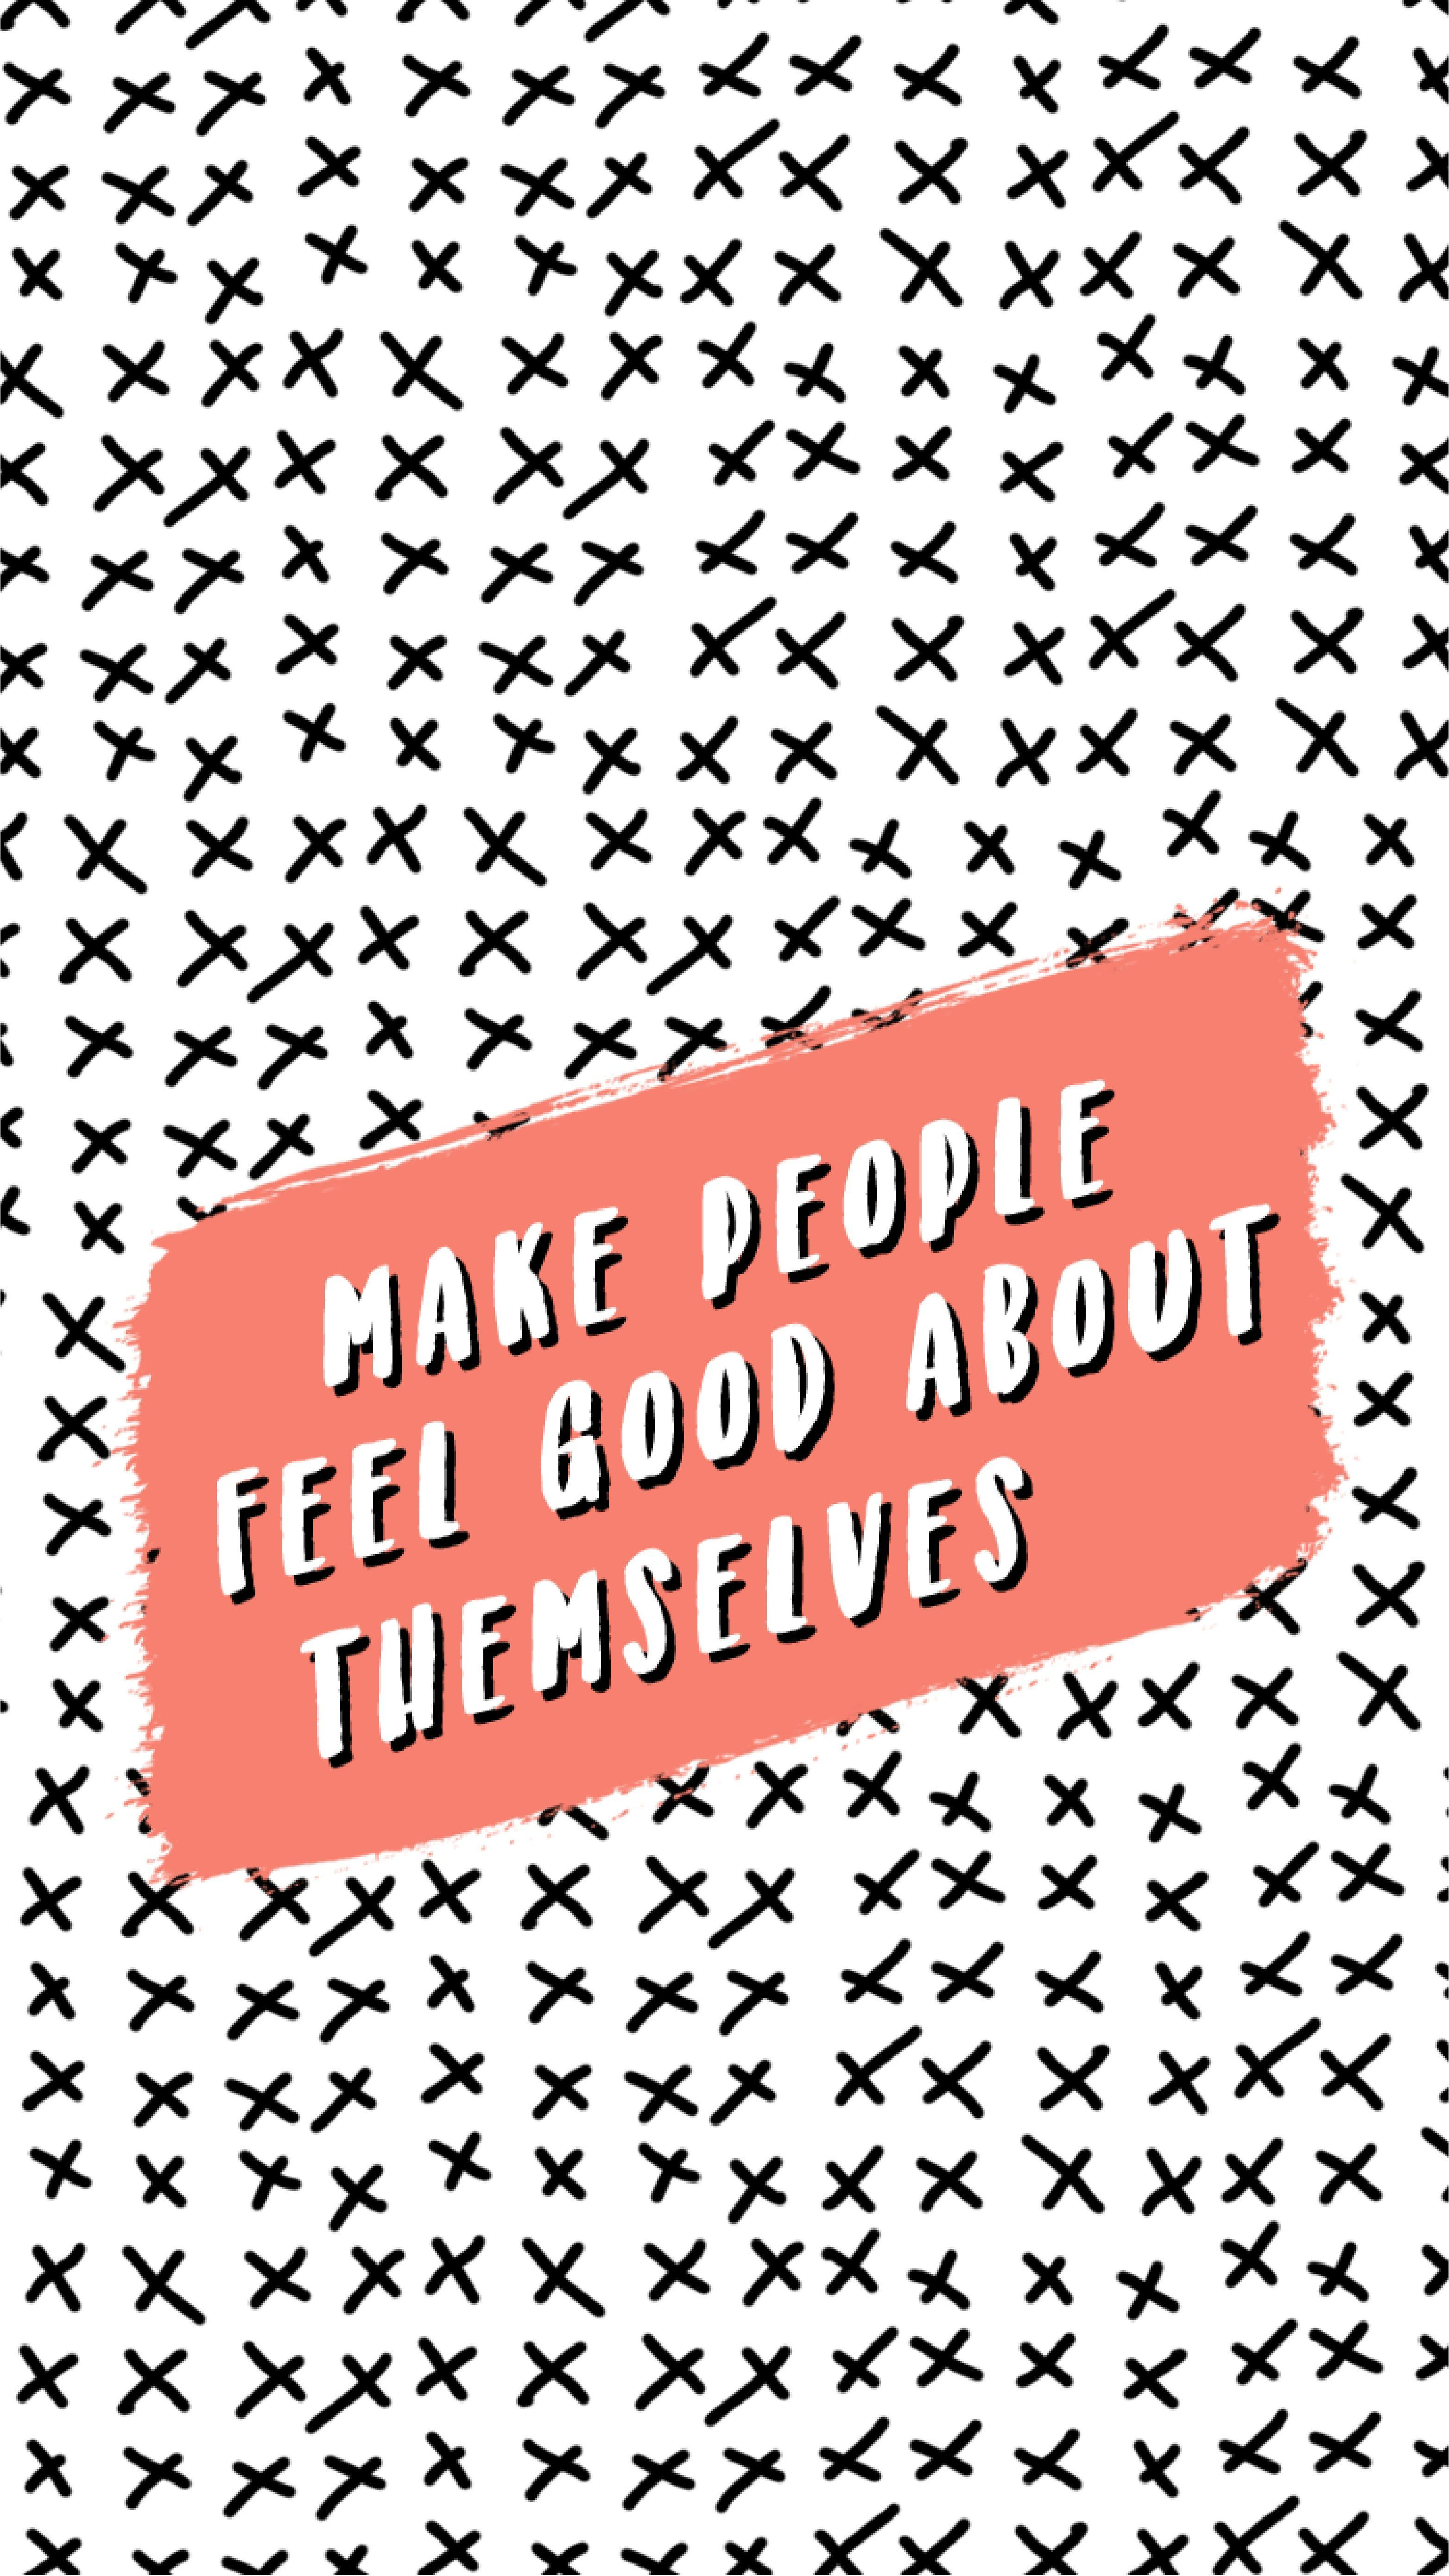 Arvowear Begooddogood Wallpaper Phone Background Arvo Happy Encouraging Goals Daily Happy Words Positive Quotes Words